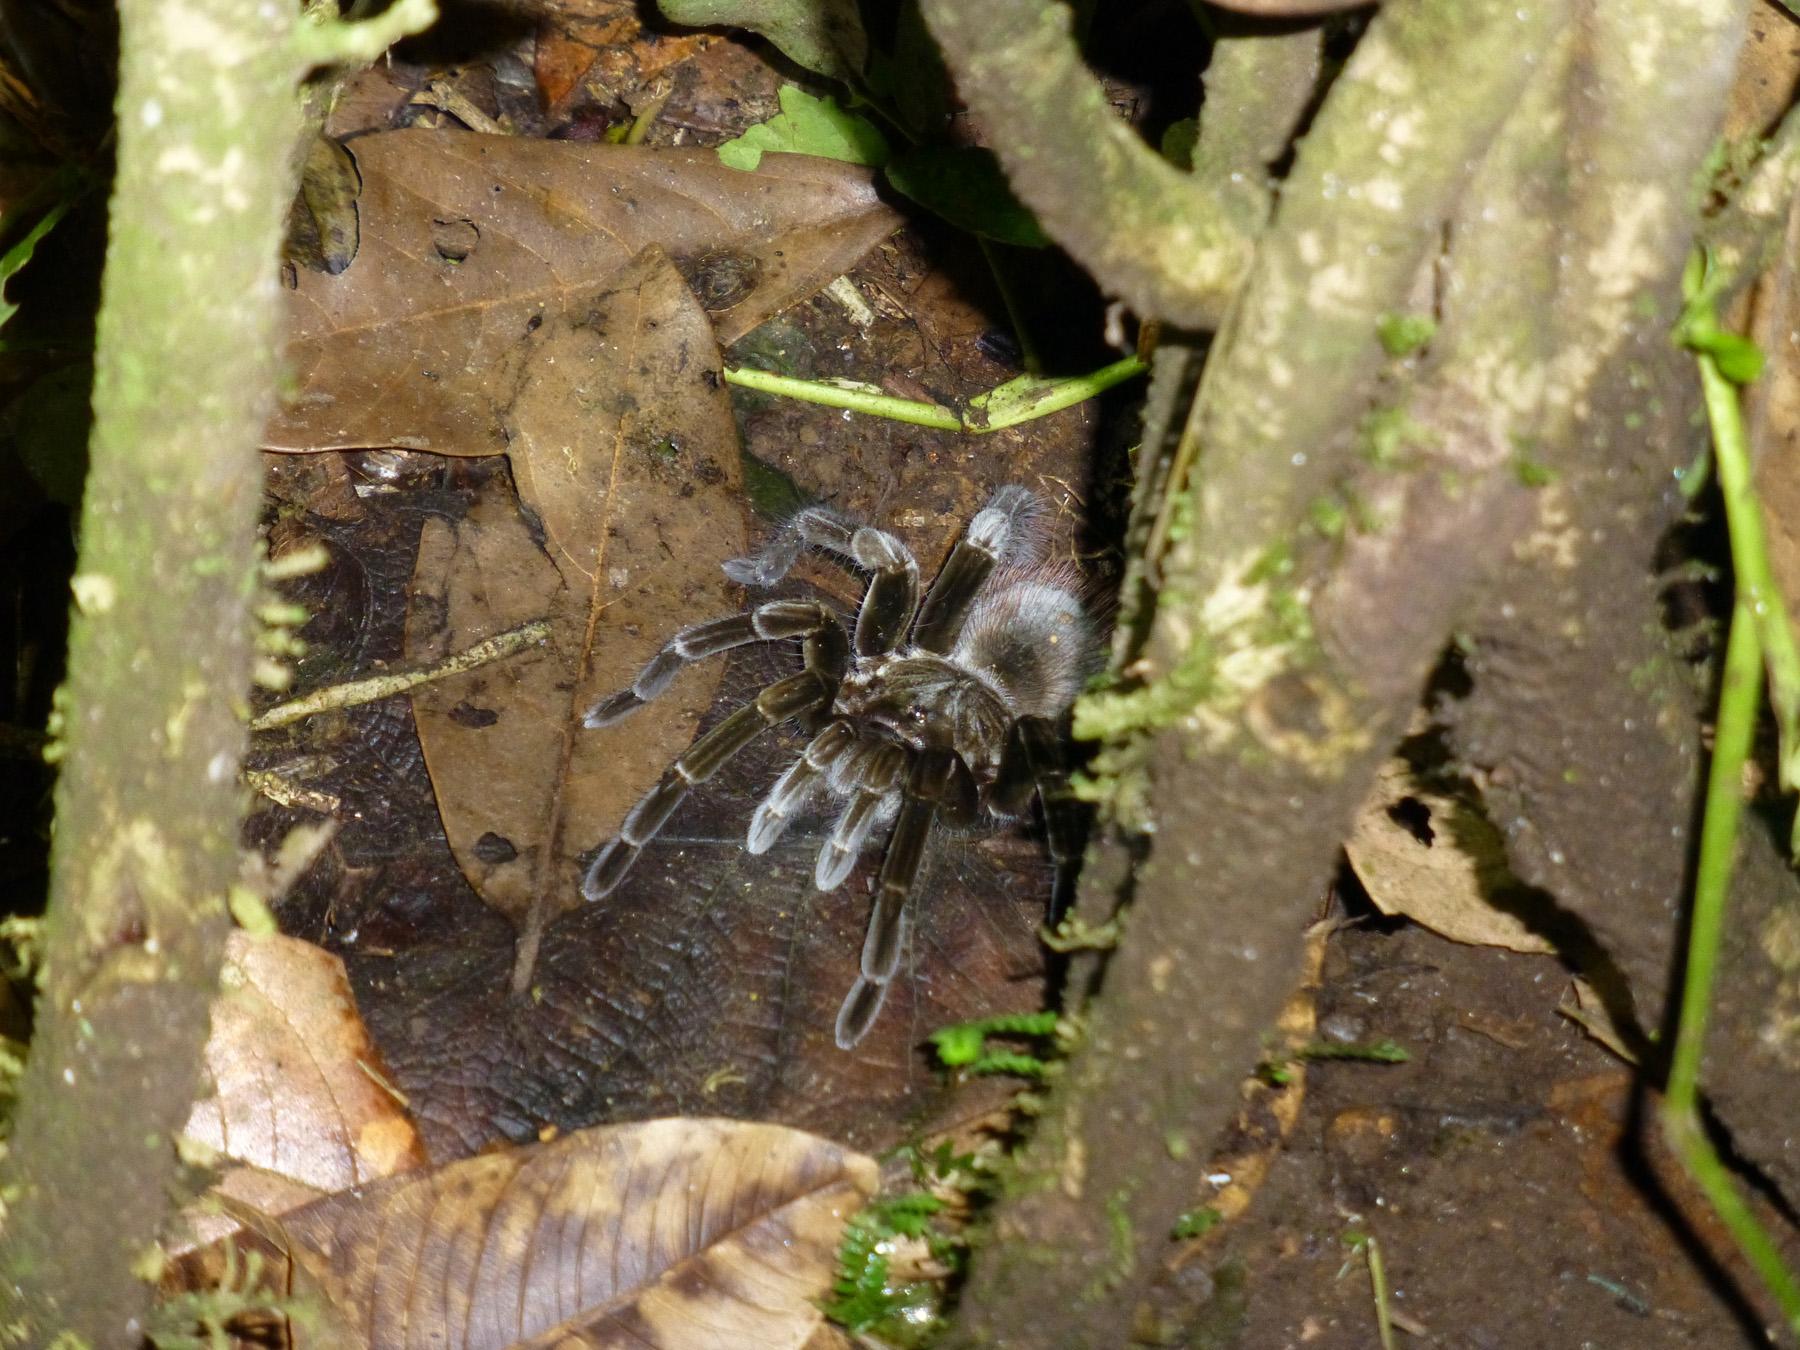 A tarantula hiding in the bush!